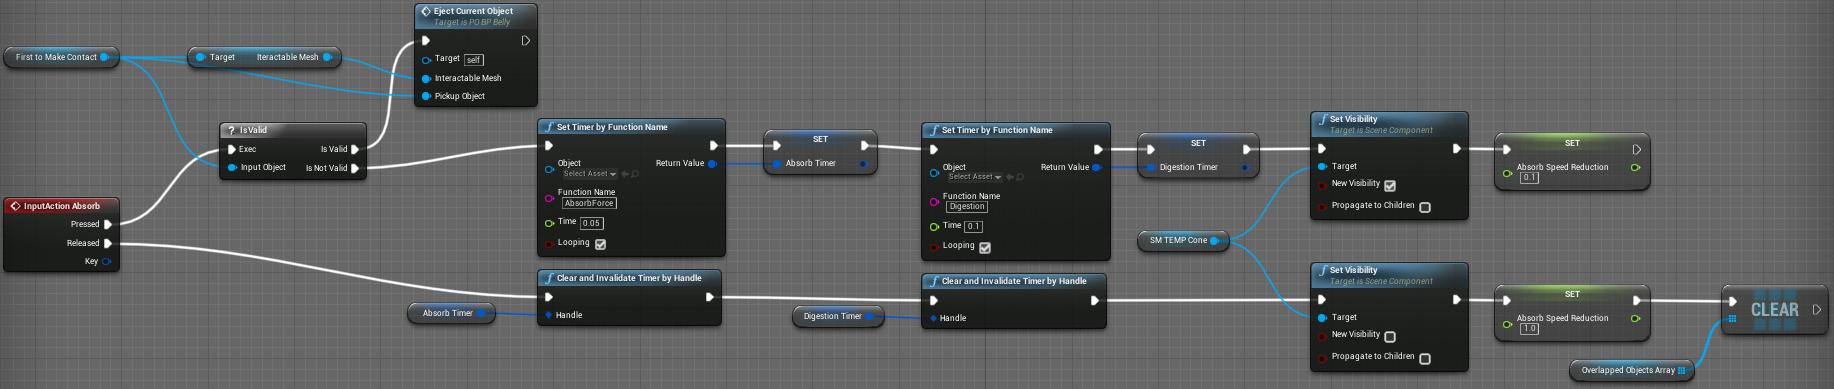 Fig 37 -  Absorb input action blueprint